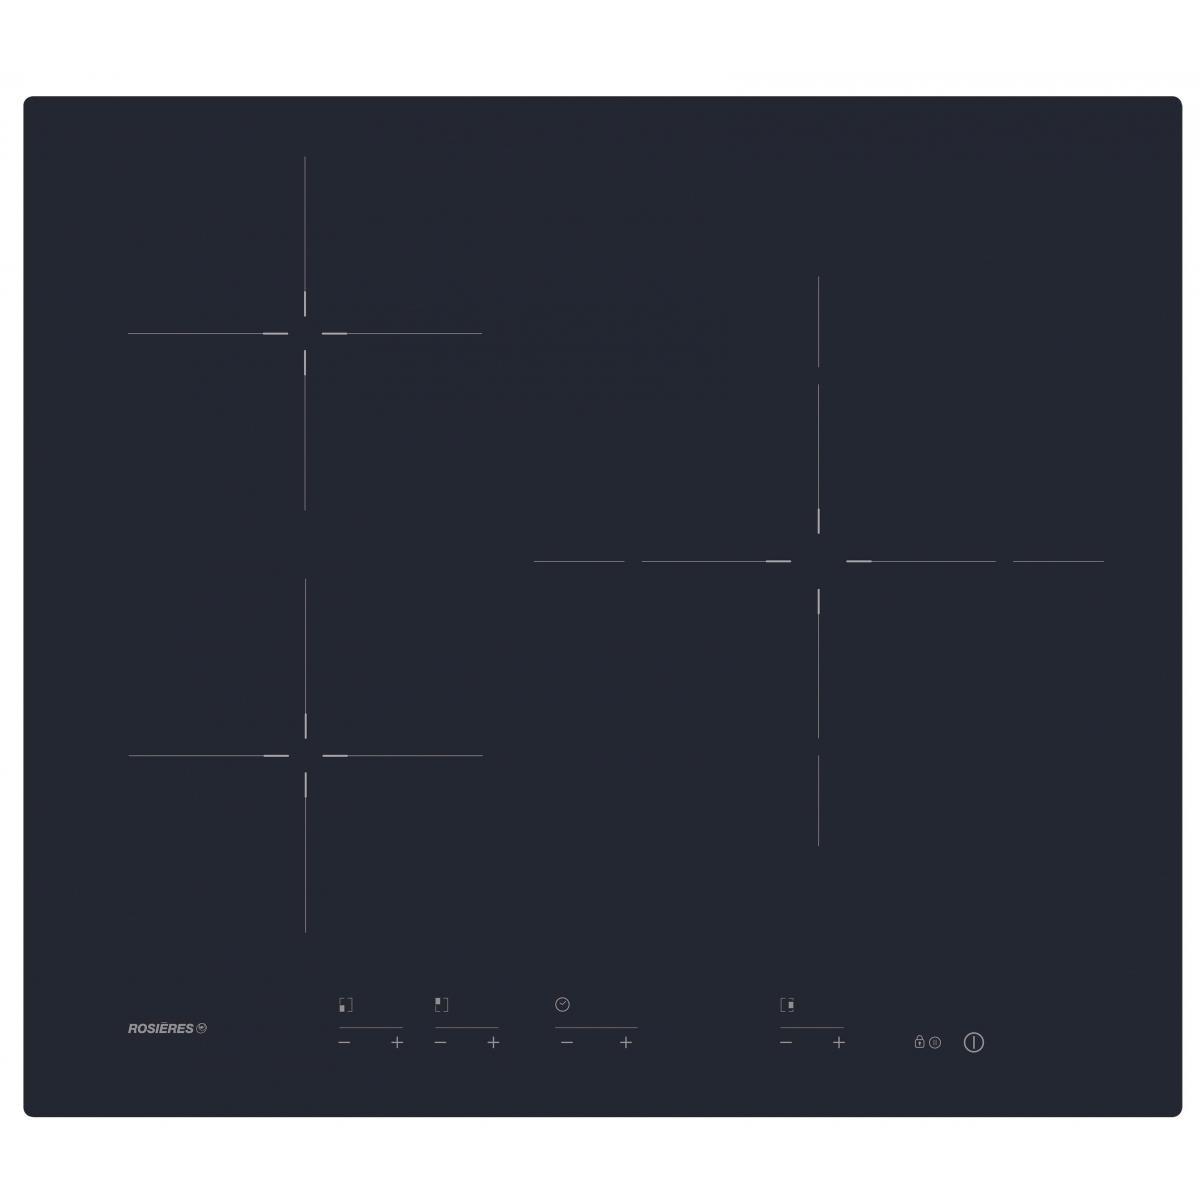 Rosieres Plaque induction ROSIèRES 60cm, RID 633 DC